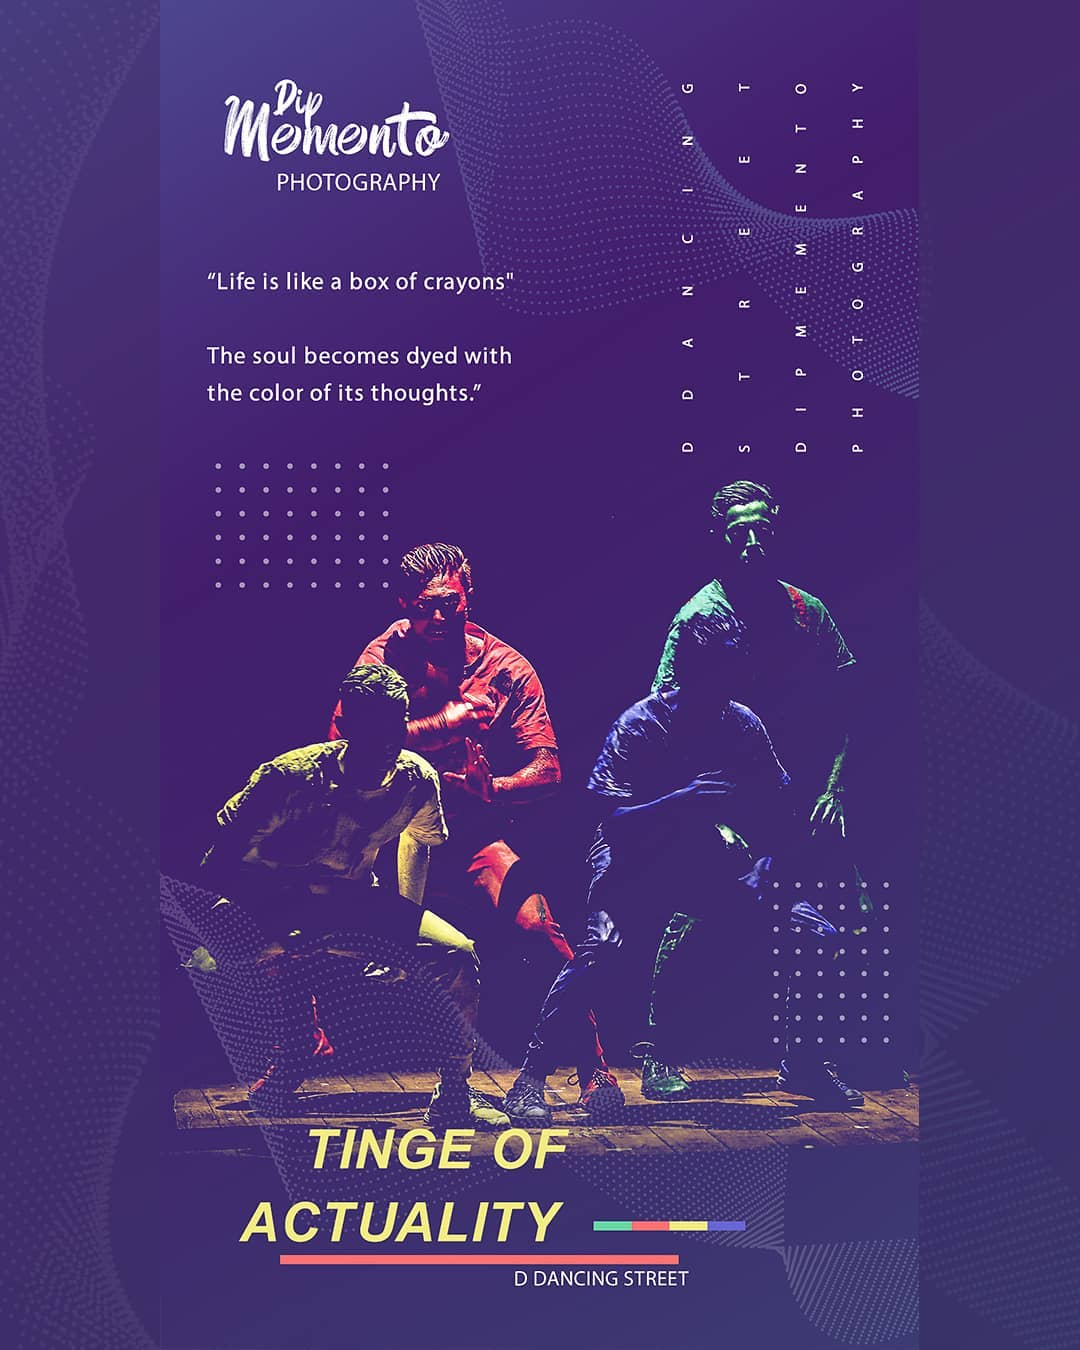 Dip Memento Photography,  Abhivyakti2019, Abhivyakti2020, music, theatre, dance, arts, insta, VisualArts, Gujarat, performancearts, Ahmedabad, amdavad, instaart, ddancingstreet, 9924227745, dipmementophotography, instagram, india, artist, artistcall, callforartists, drama, calltoartists, artfair, play, dancerslife, dancephotography, dancersofindia, Danceshoot, danceplus5